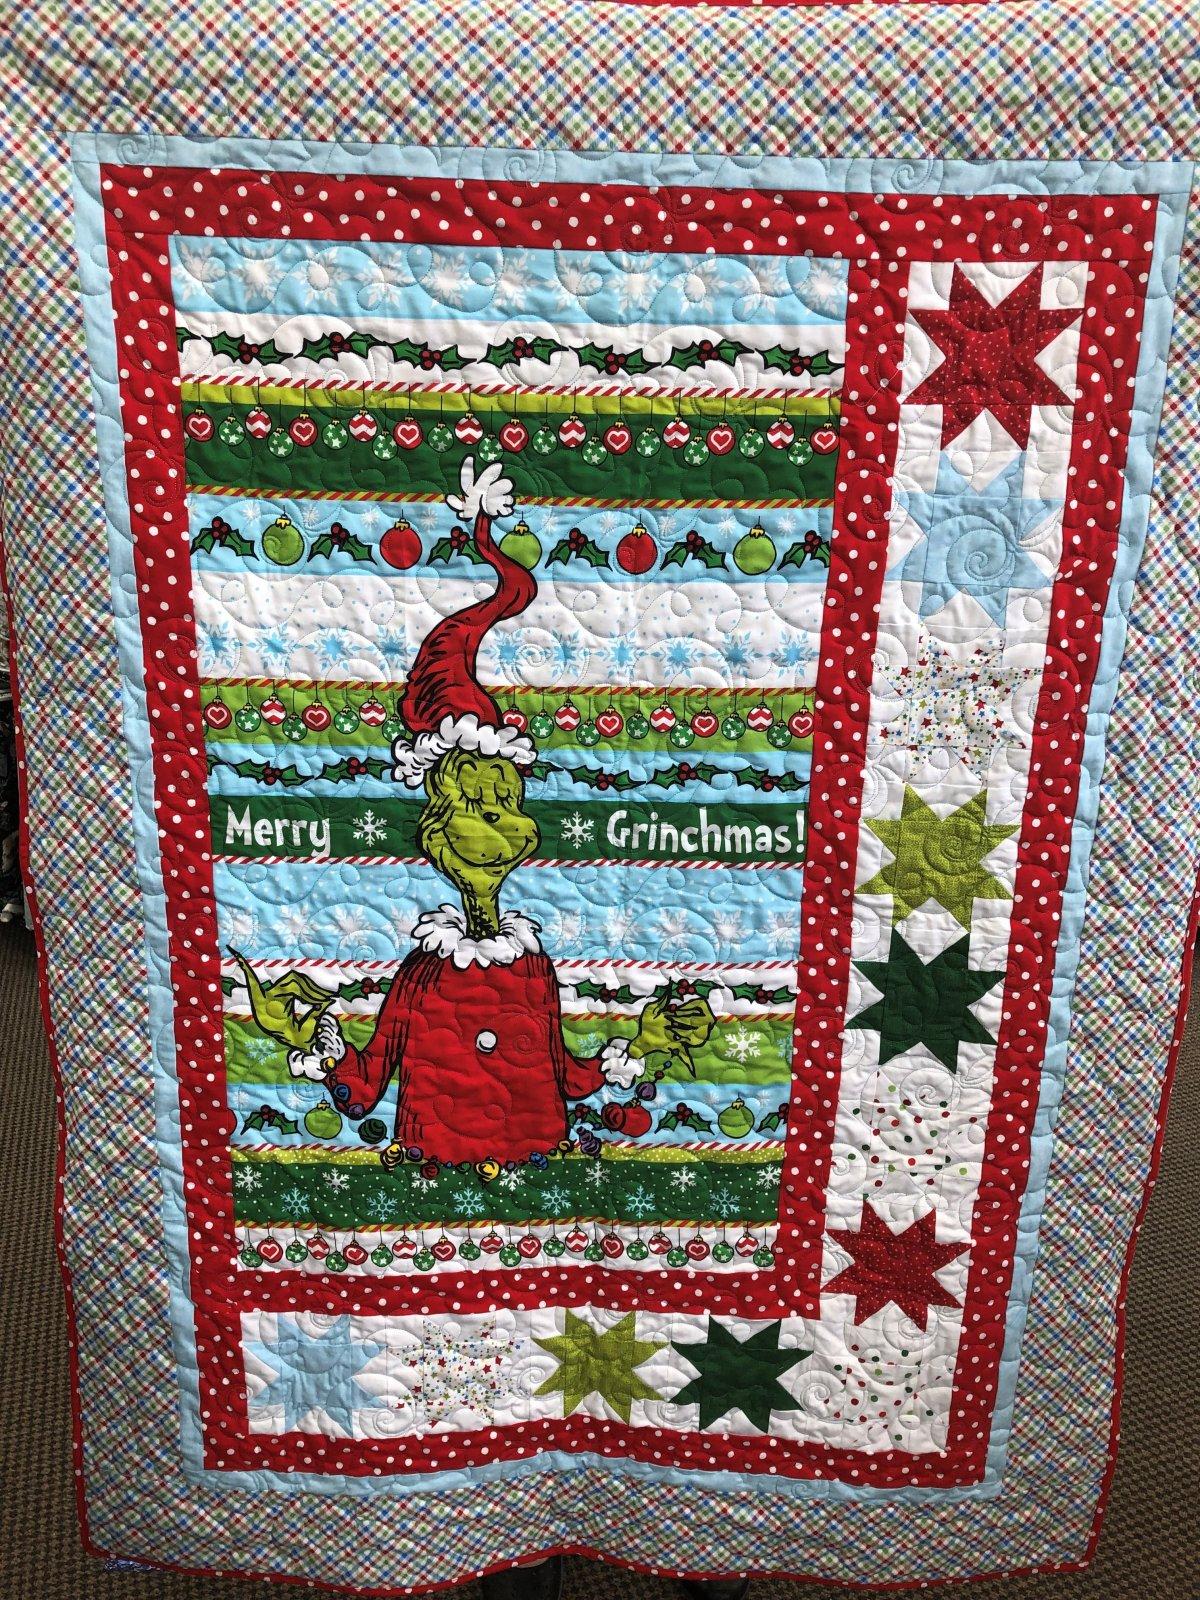 Merry Grinchmas Quilt Kit